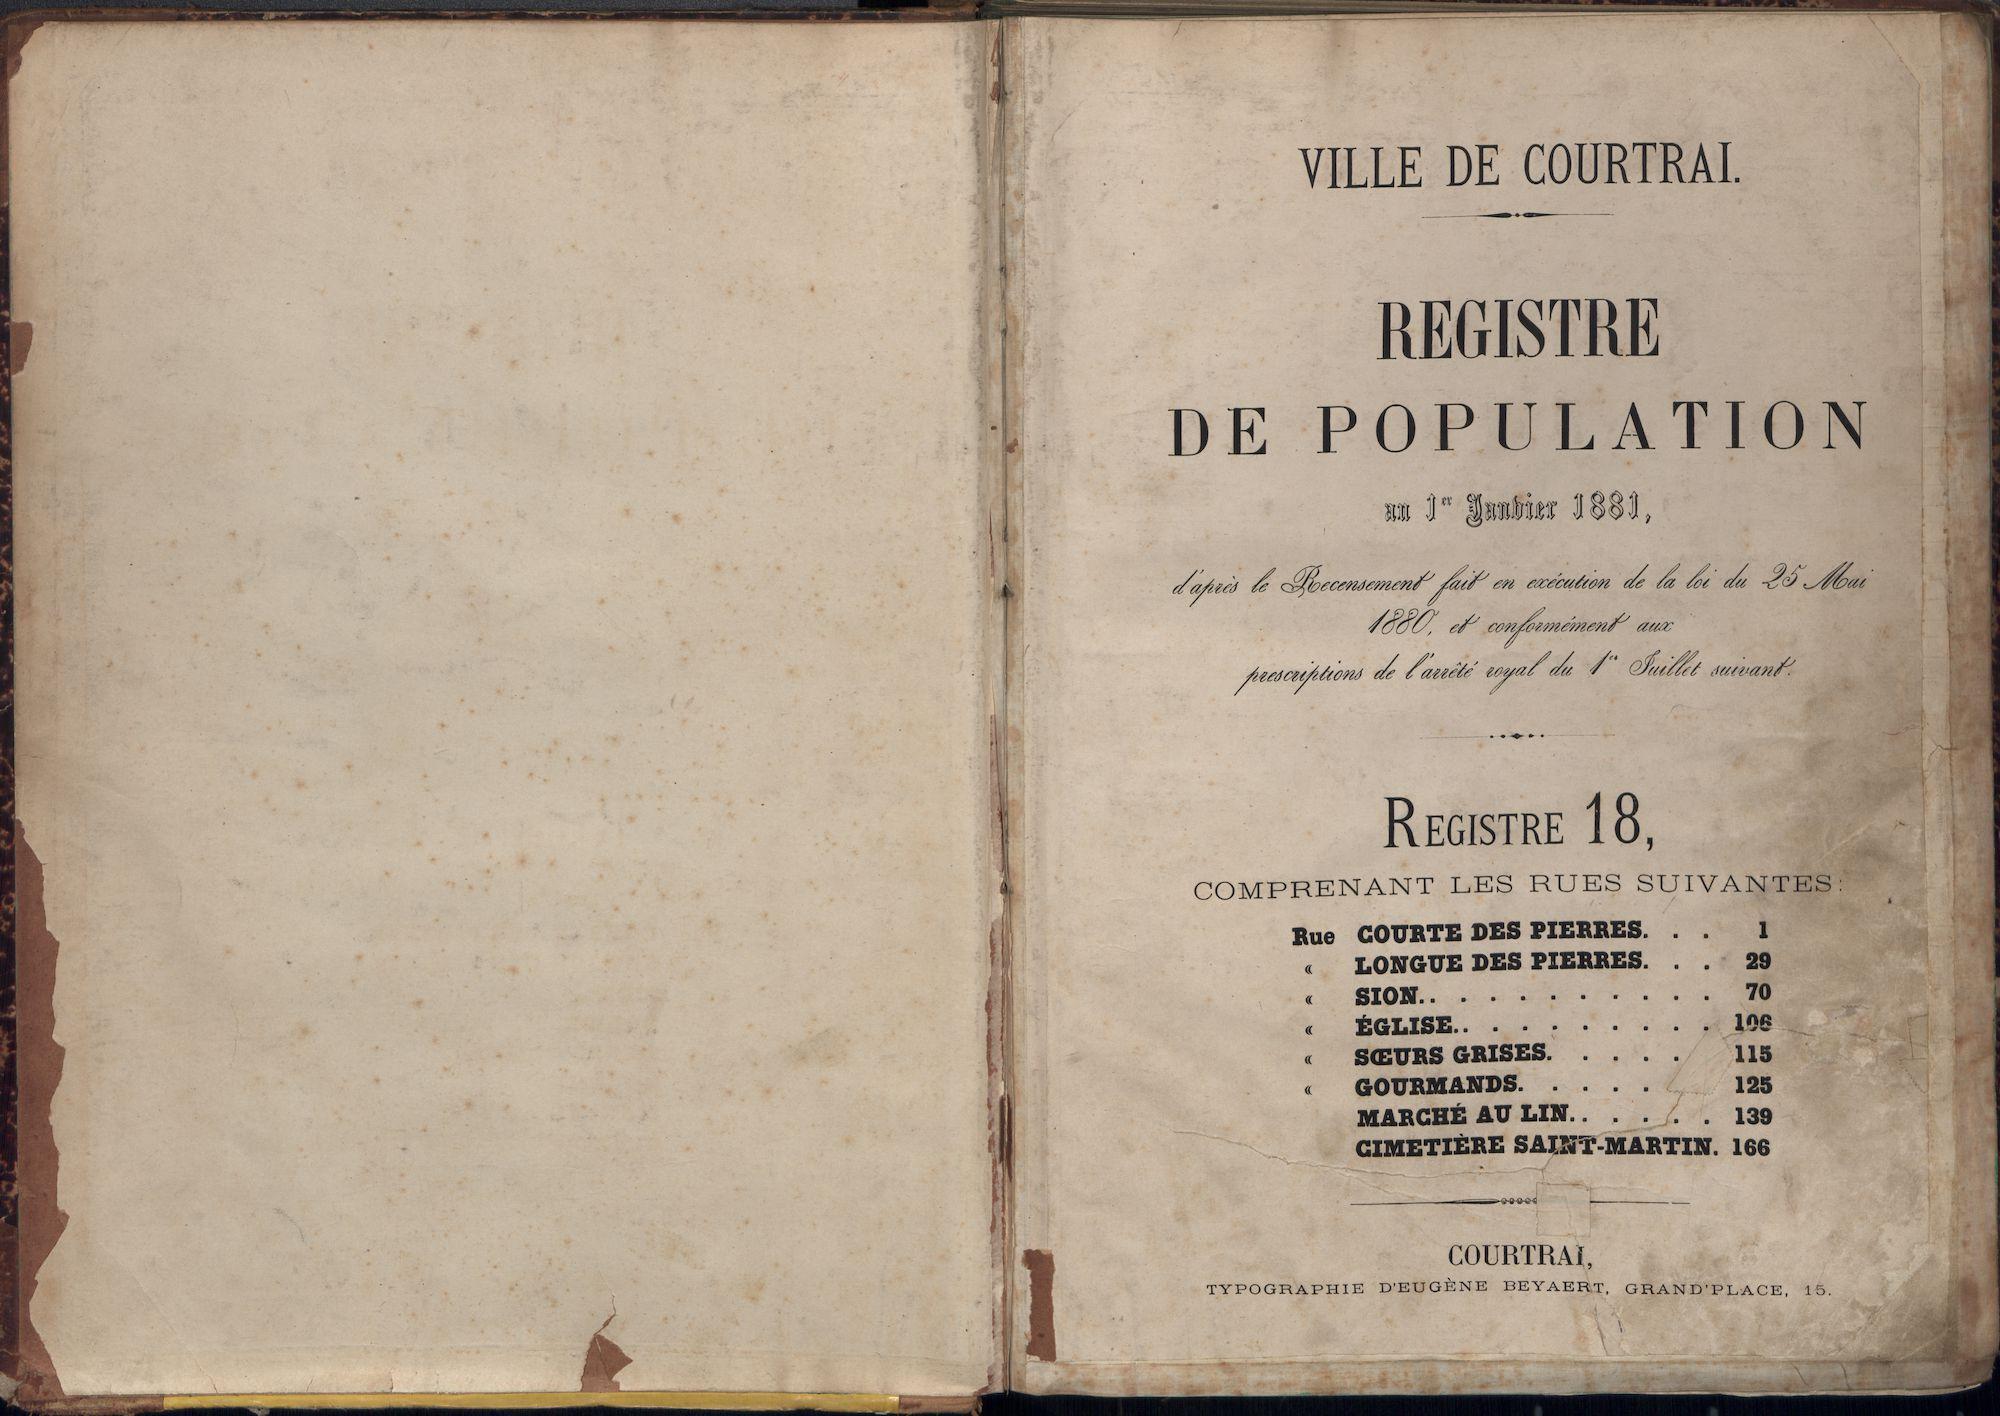 Bevolkingsregister Kortrijk 1880 boek 18